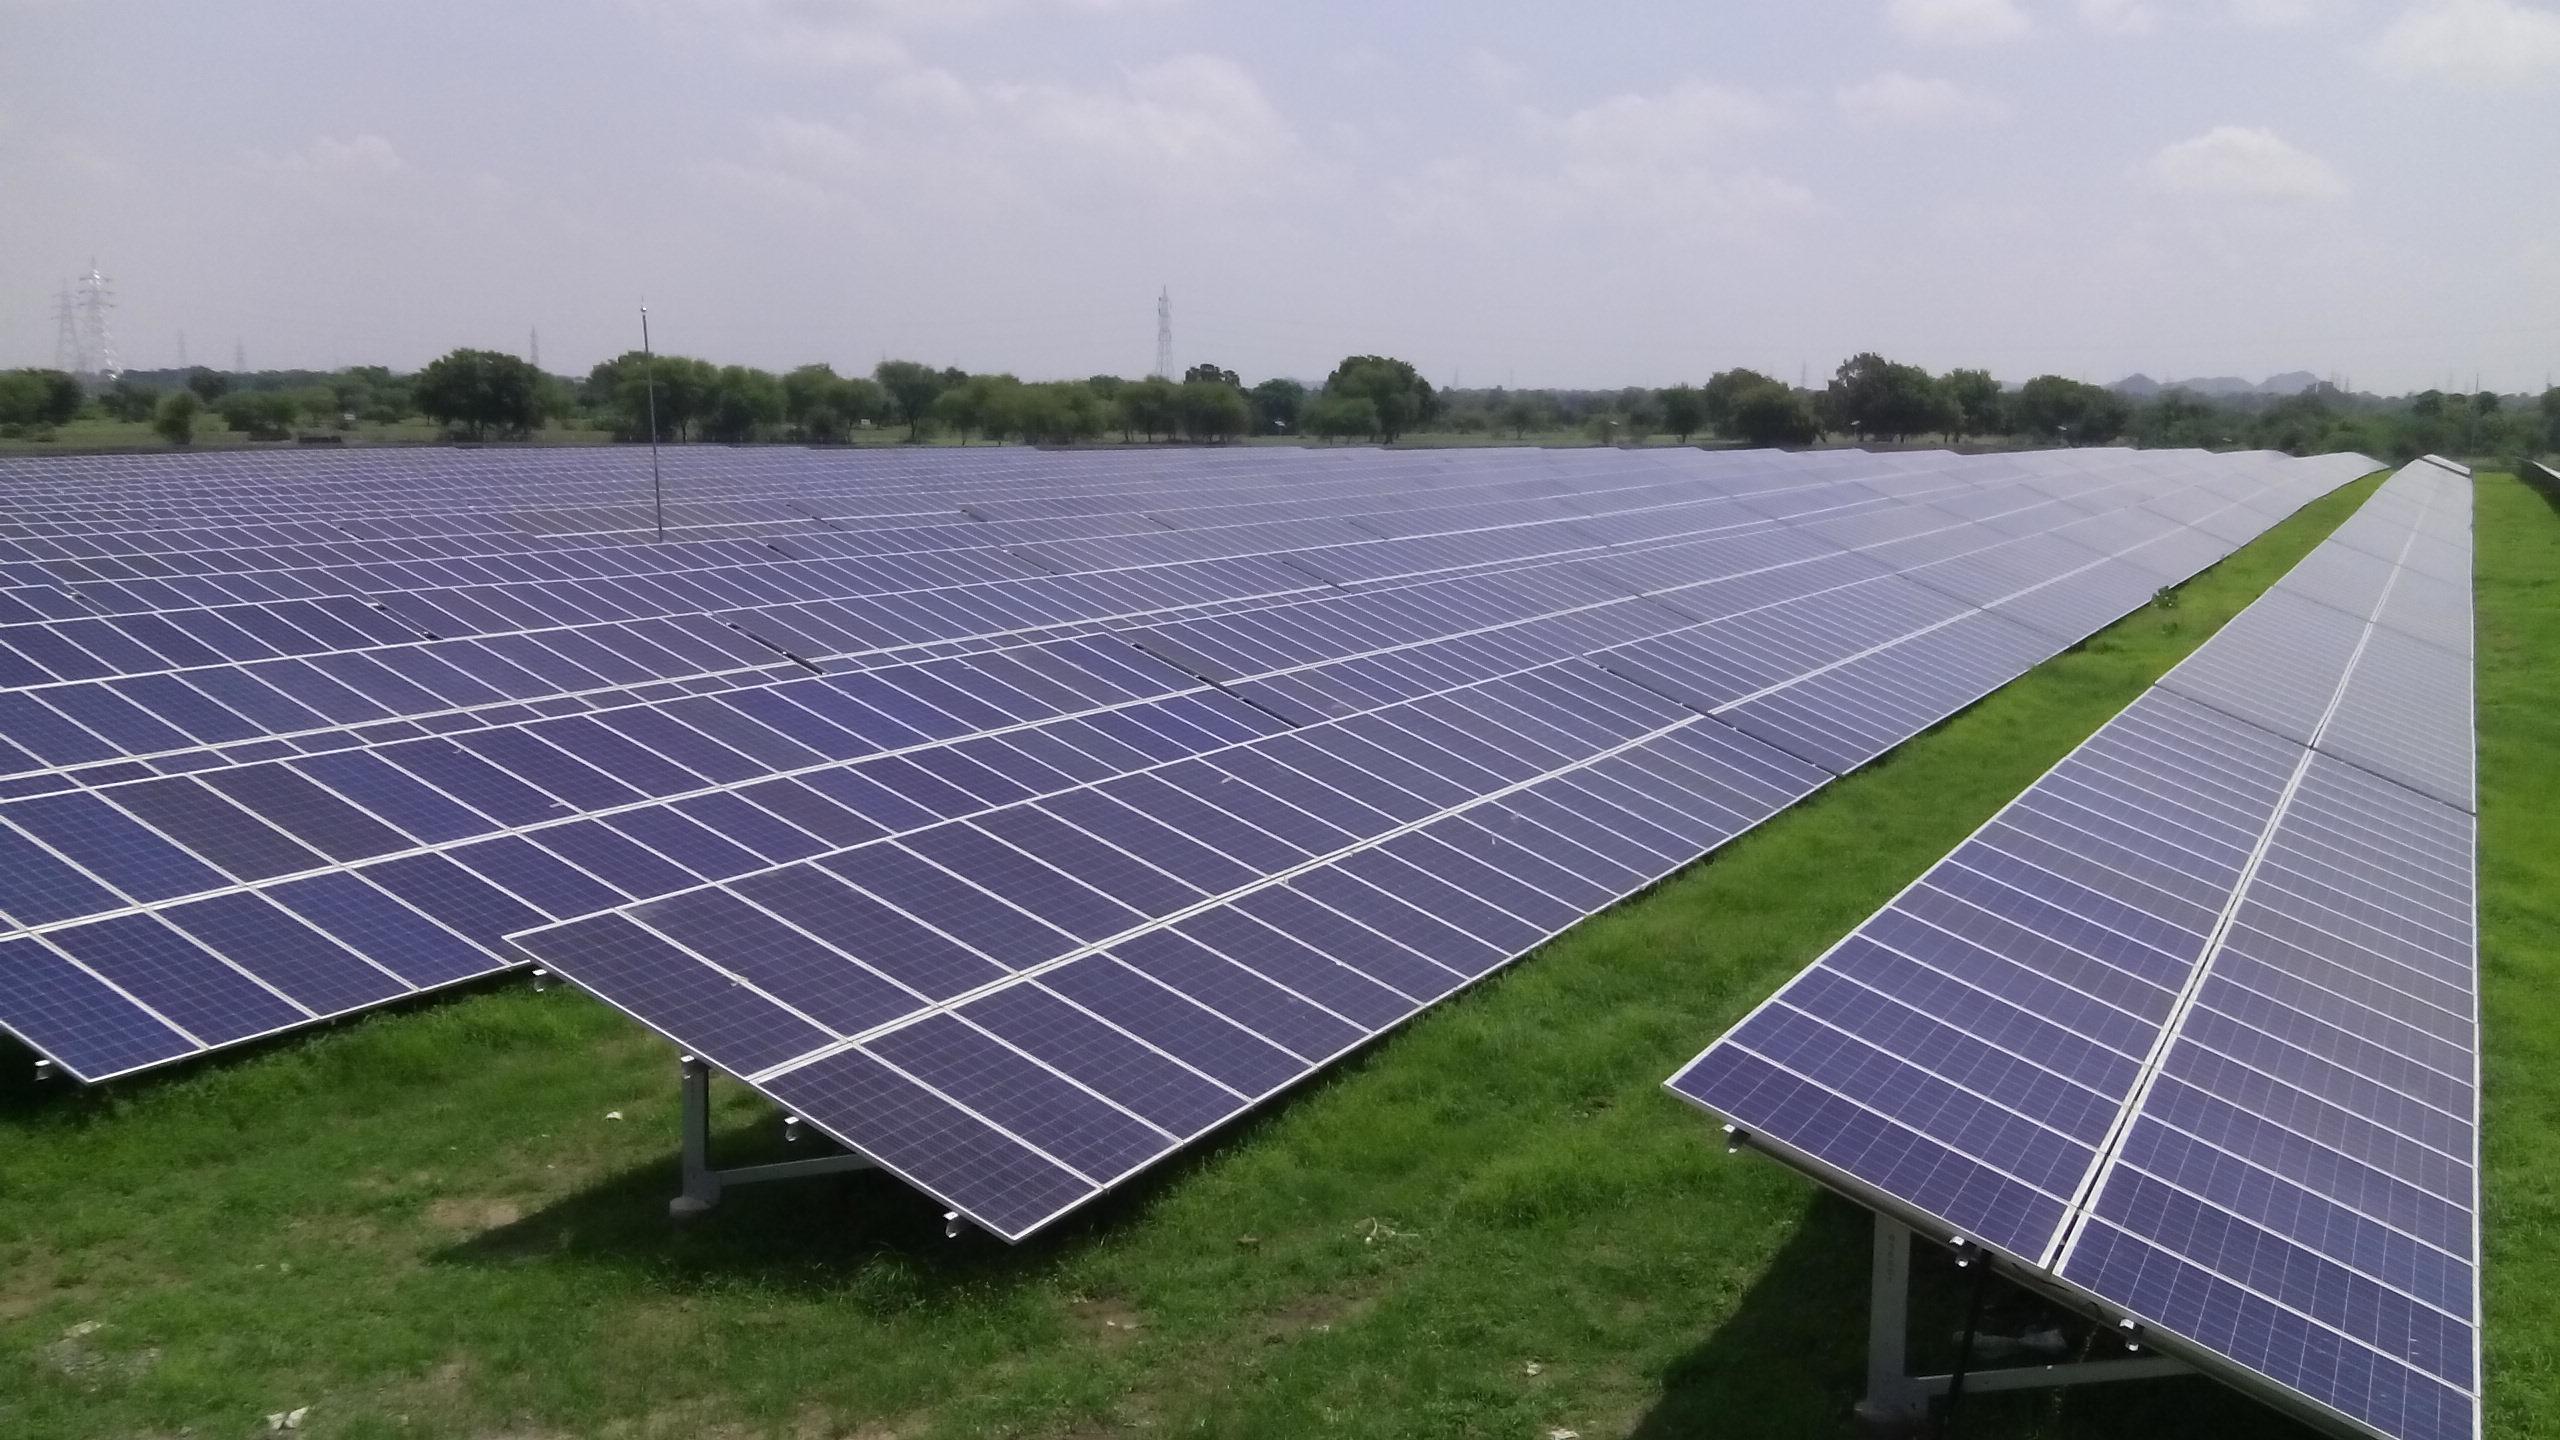 Agrawal Renewable Energy Pvt Ltd